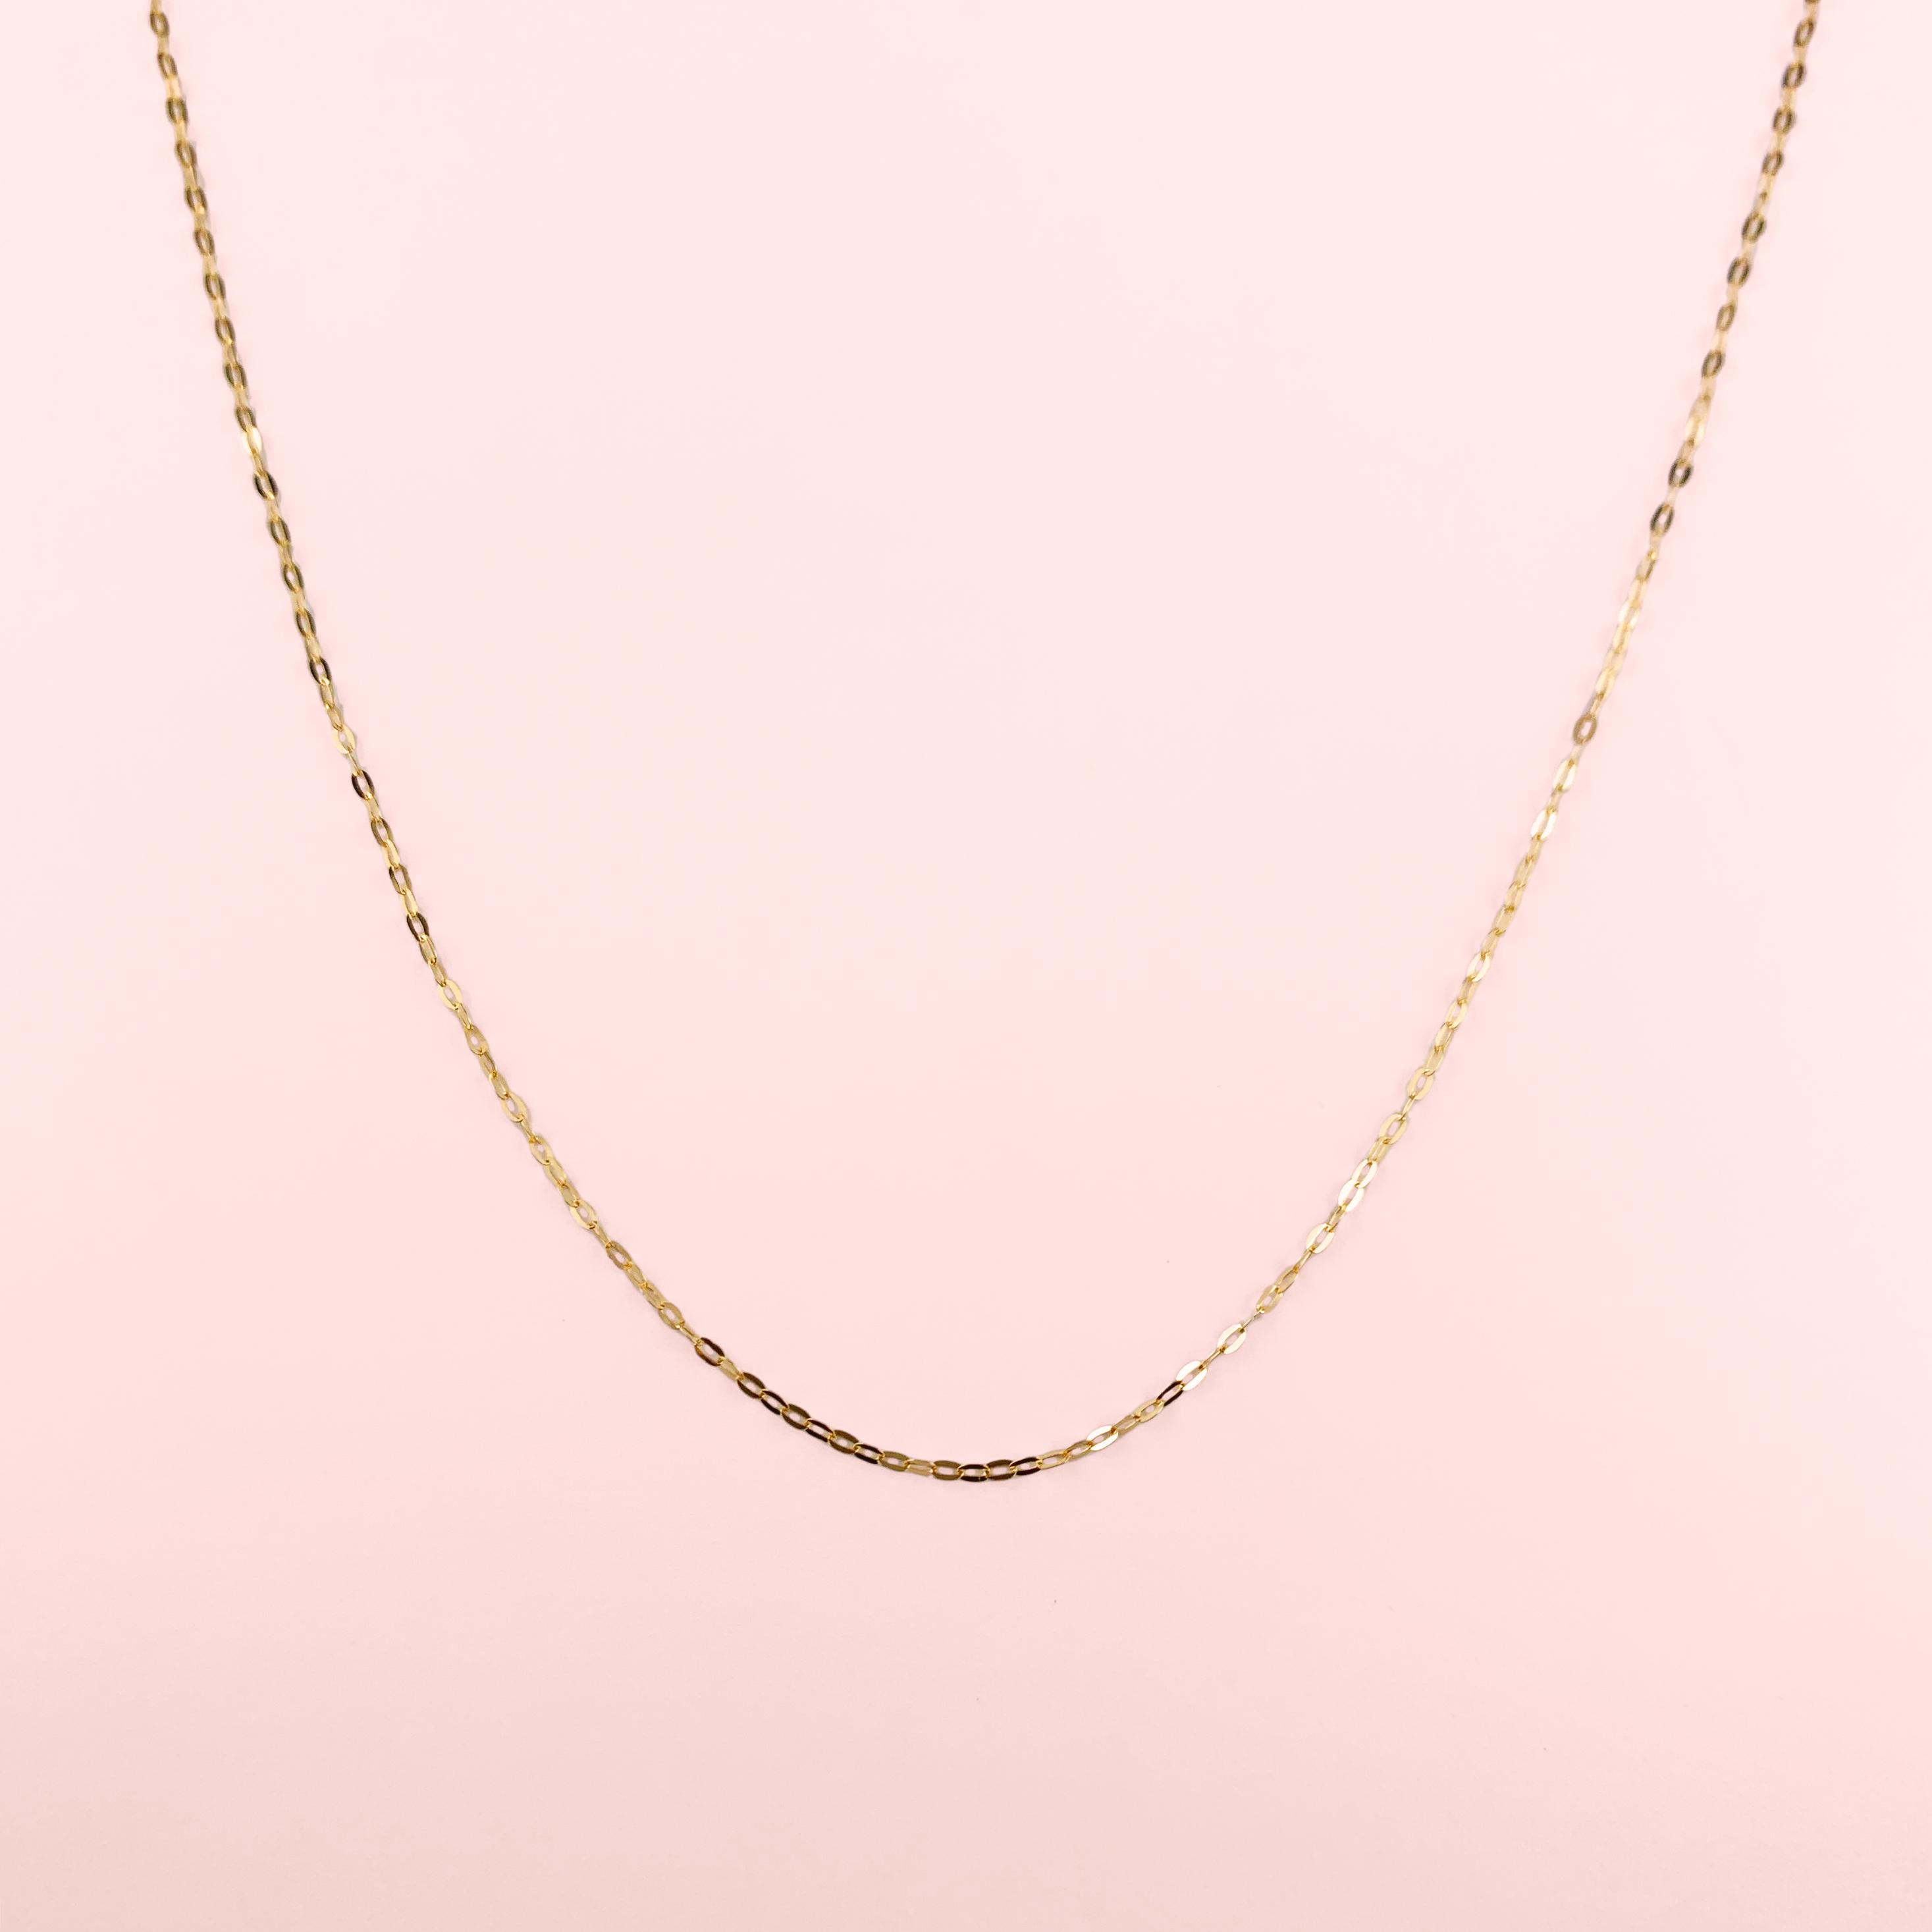 K18YG Necklace(45cm / アジャスター付き)